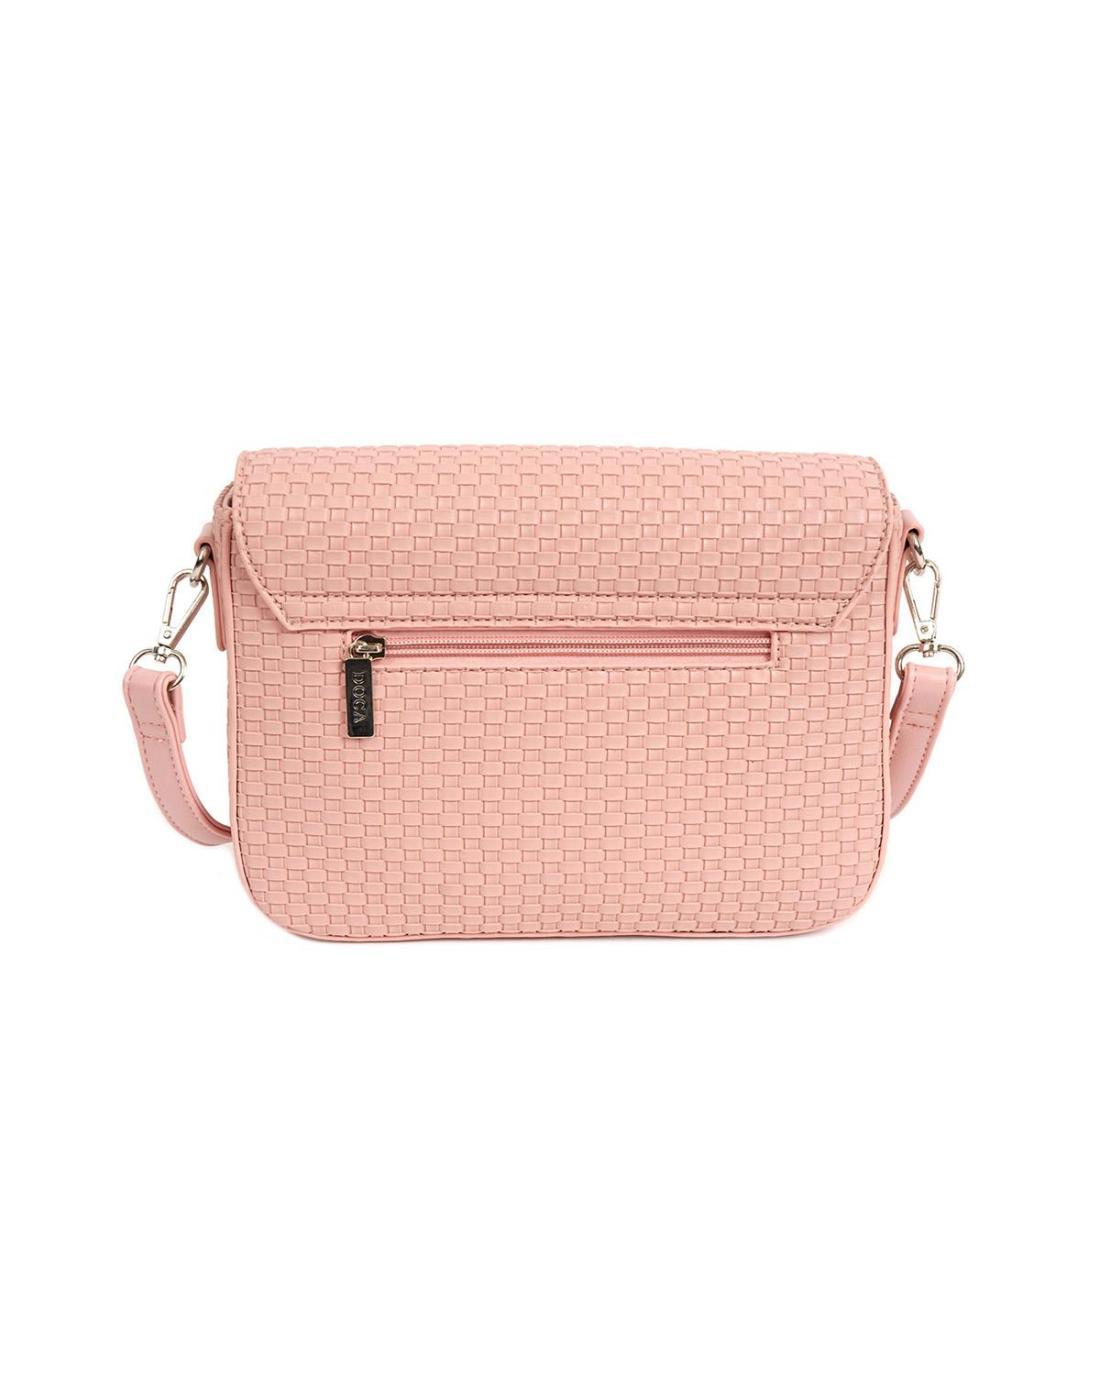 Pink cross body bag